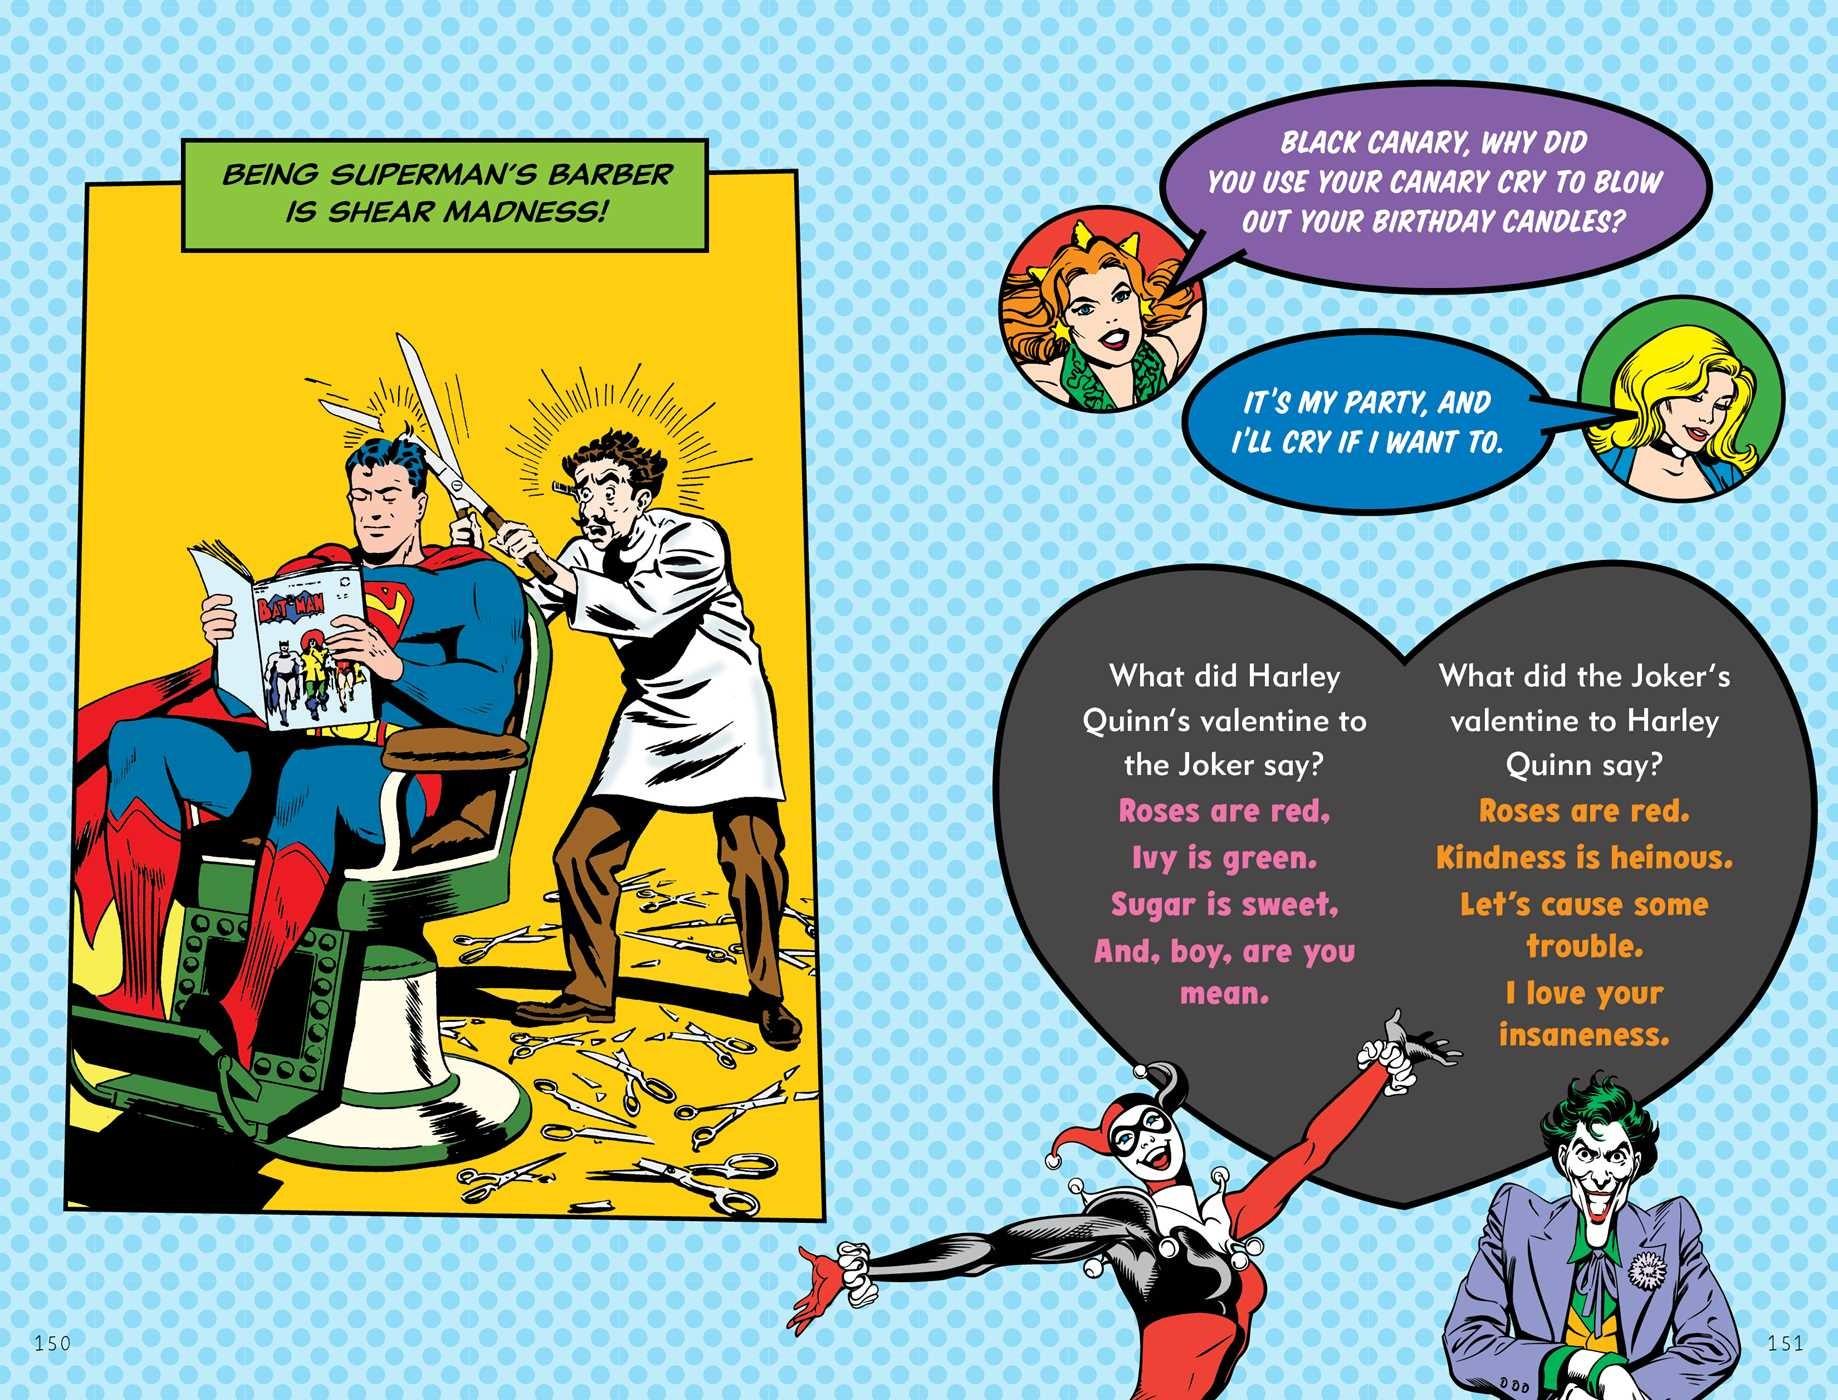 The official dc super hero joke book 9781941367339.in05